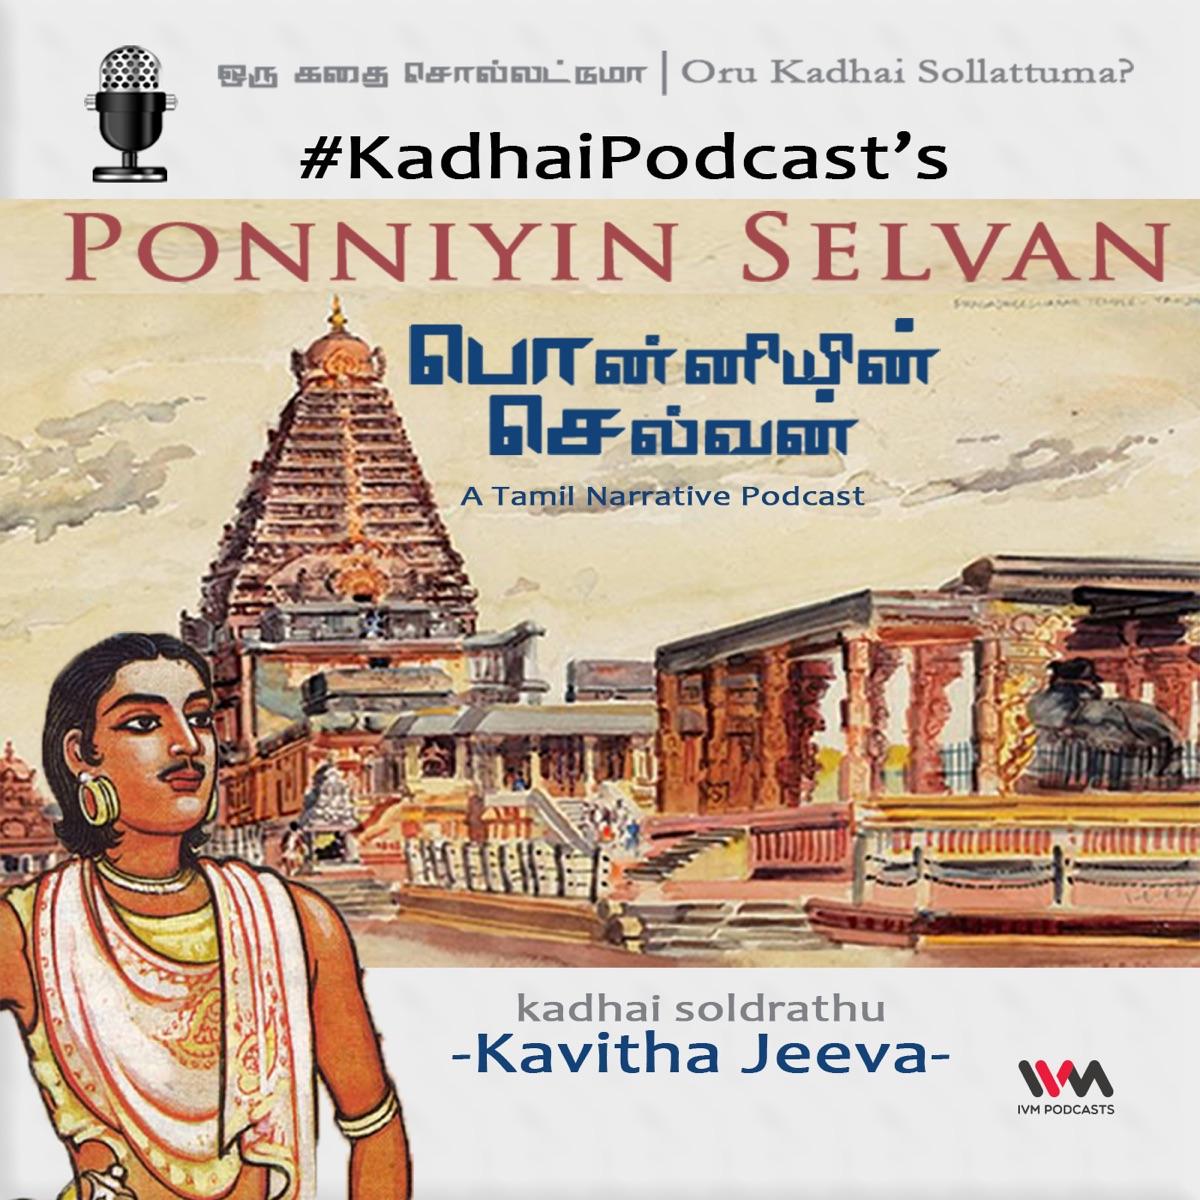 KadhaiPodcast's PonniyinSelvan